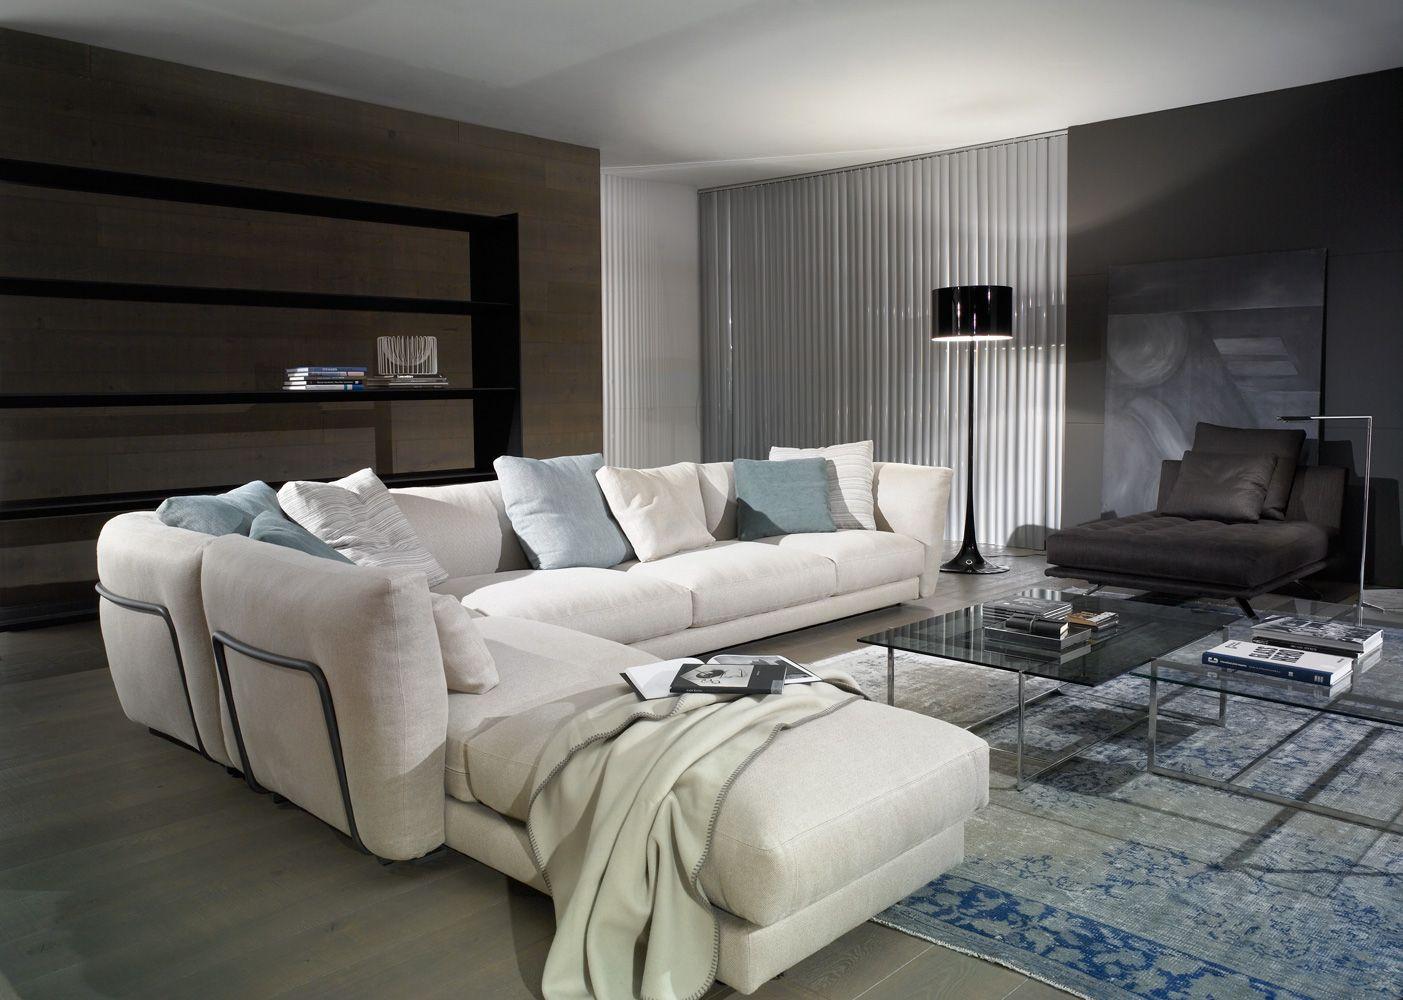 Casades s furniture design barcelona form collection - Sofas diseno barcelona ...